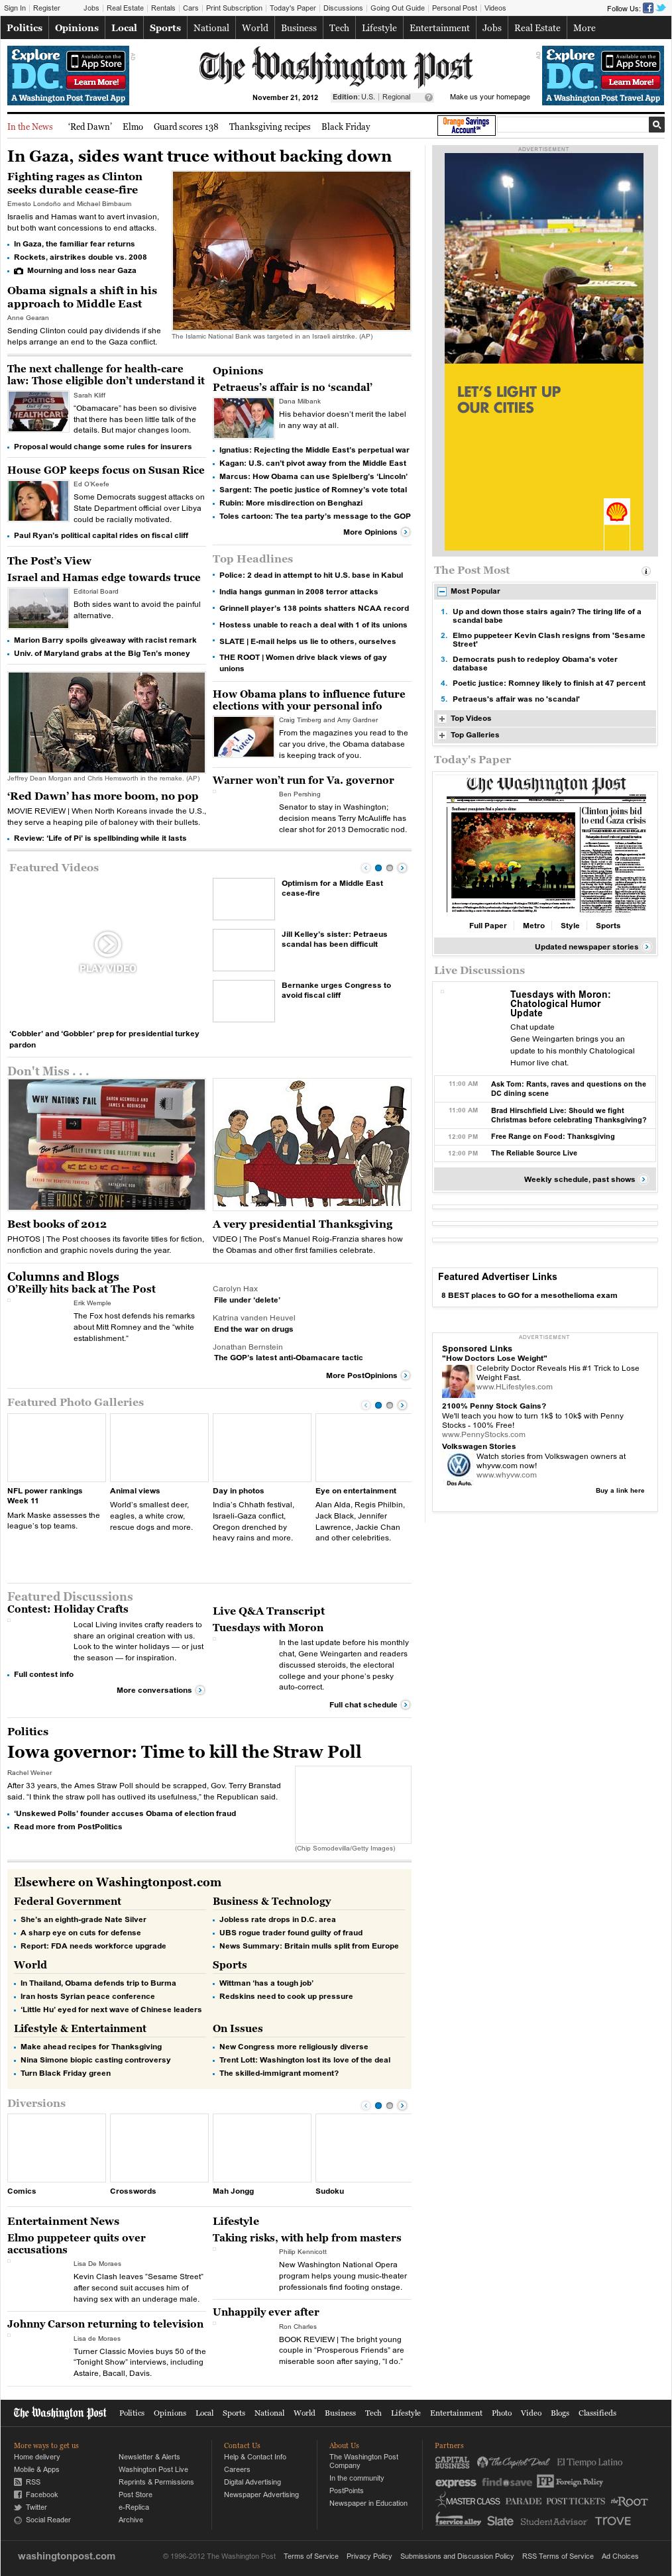 The Washington Post at Wednesday Nov. 21, 2012, 8:32 a.m. UTC